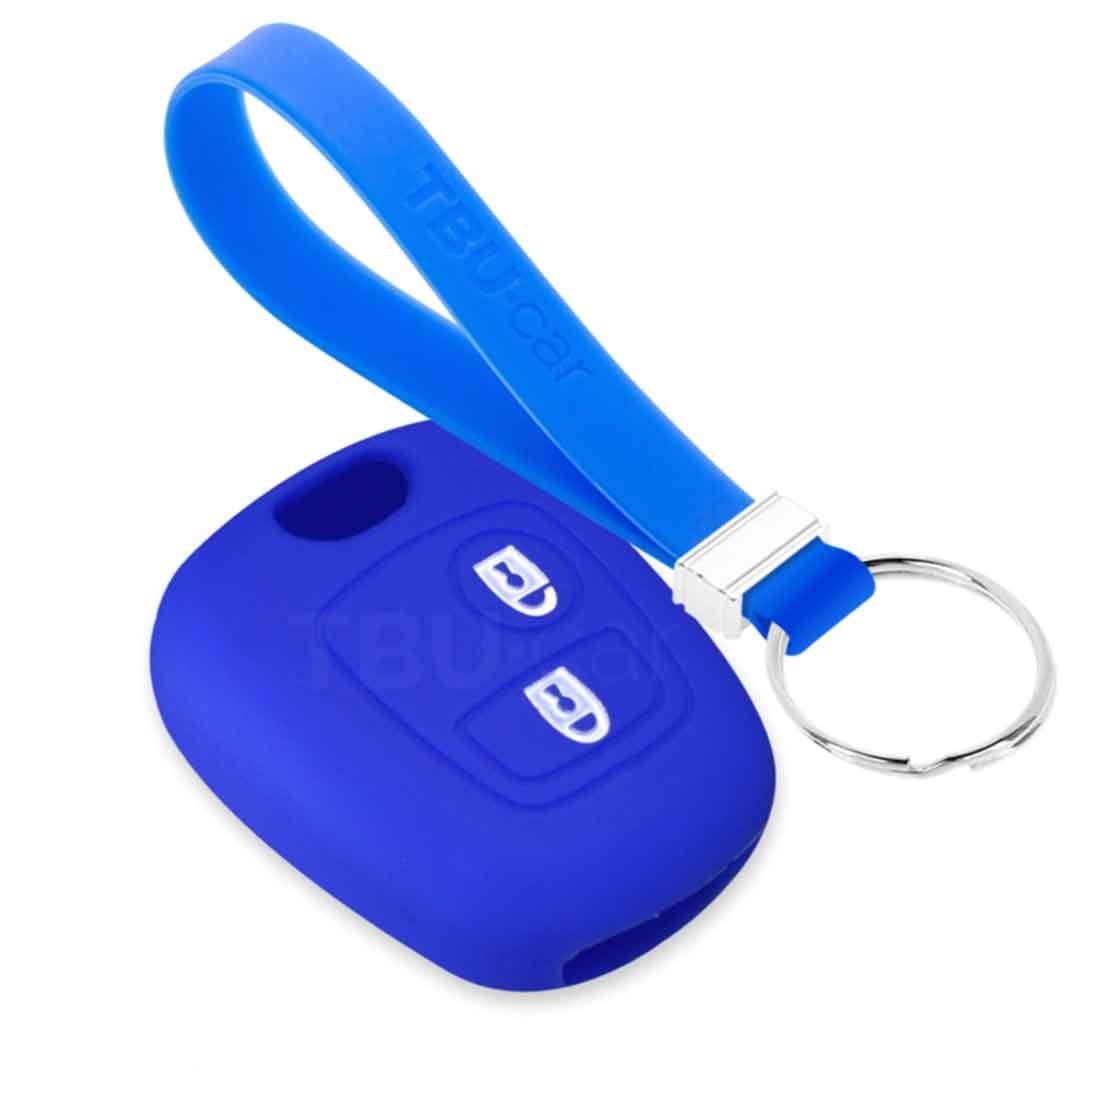 TBU car TBU car Autoschlüssel Hülle kompatibel mit Citroën 2 Tasten - Schutzhülle aus Silikon - Auto Schlüsselhülle Cover in Blau